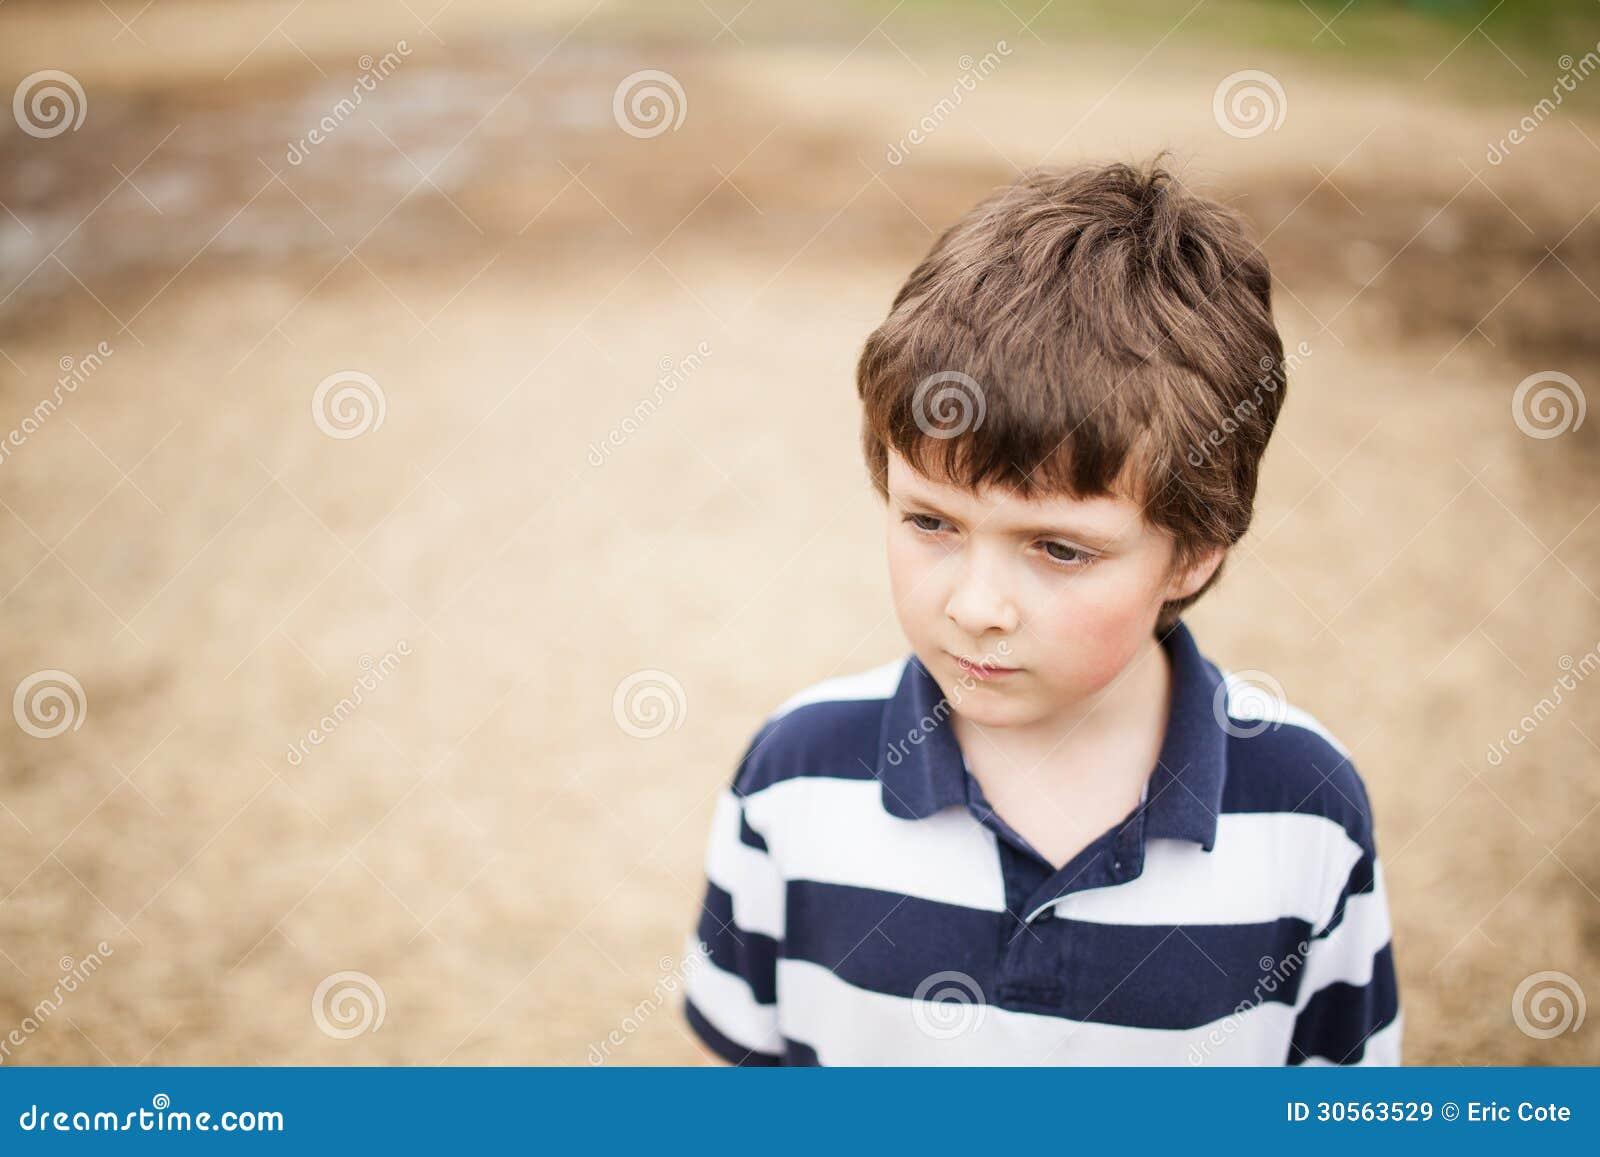 Download Wallpaper Attitude Little Boy - sad-little-boy-standing-sand-30563529  Trends_86777.jpg